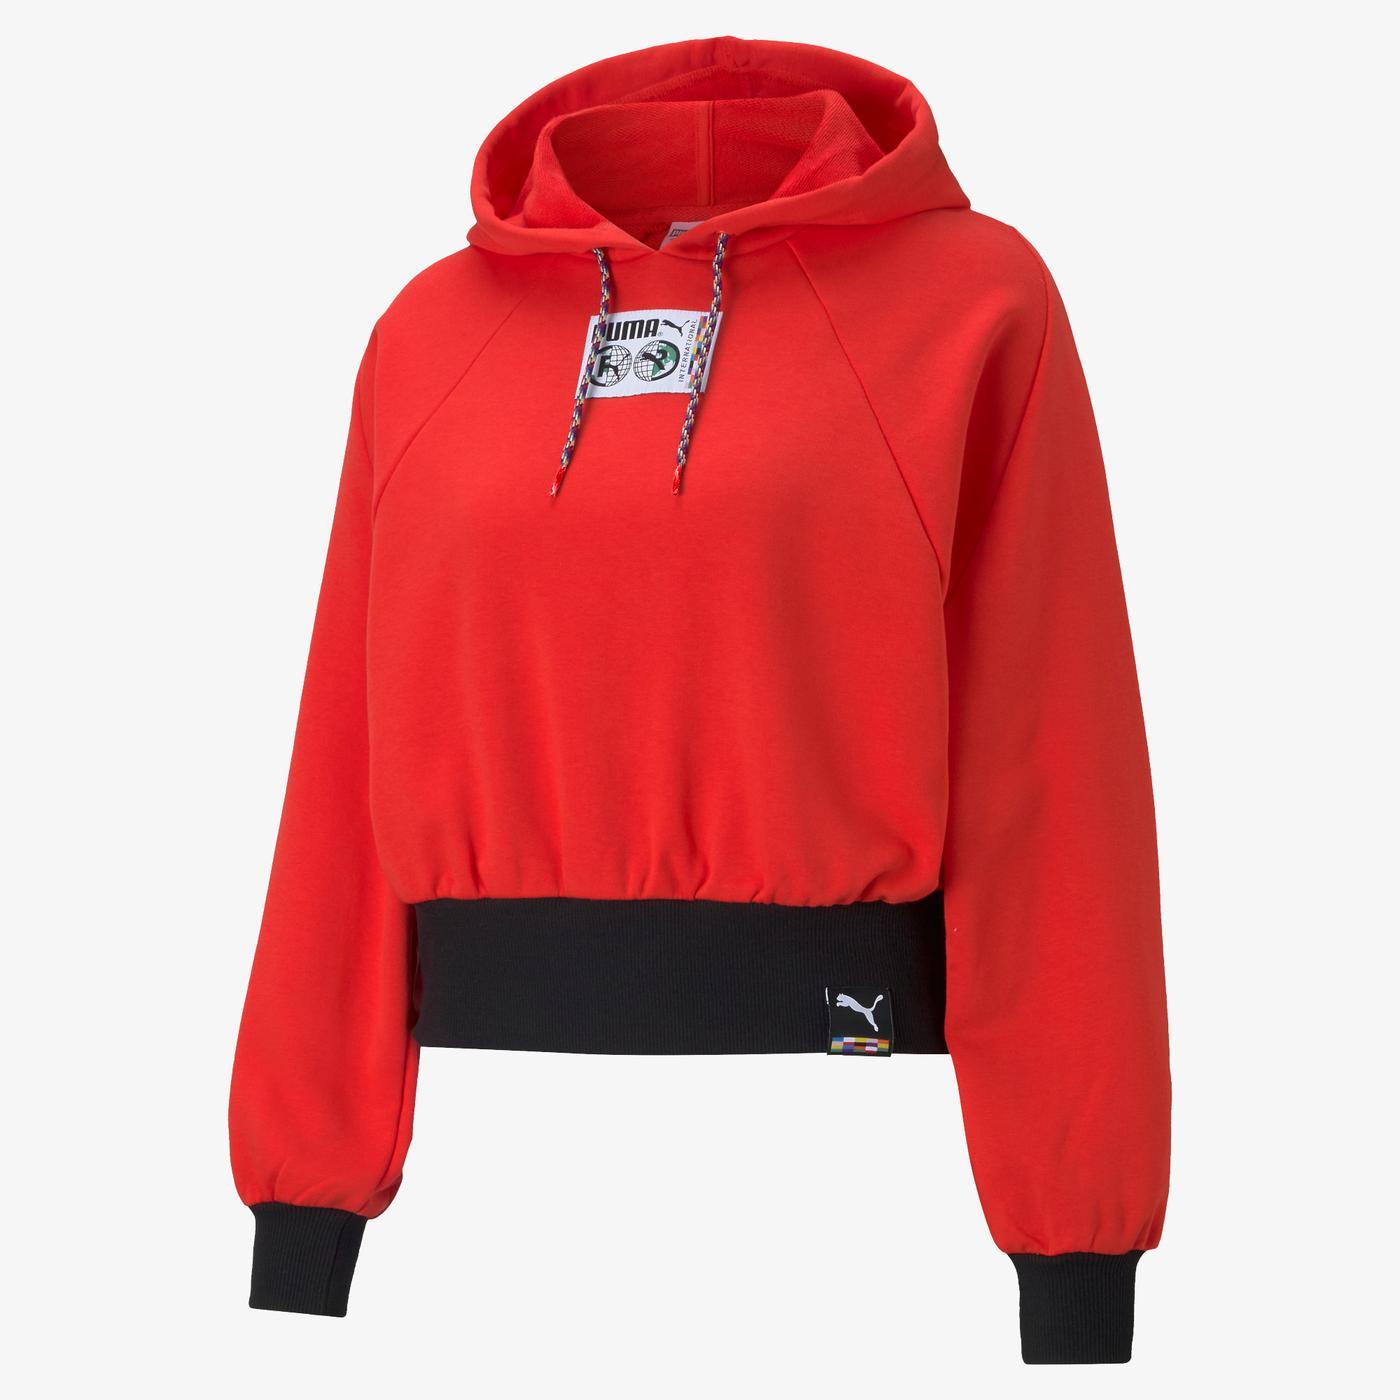 Puma International Kadın Kırmızı Sweatshirt